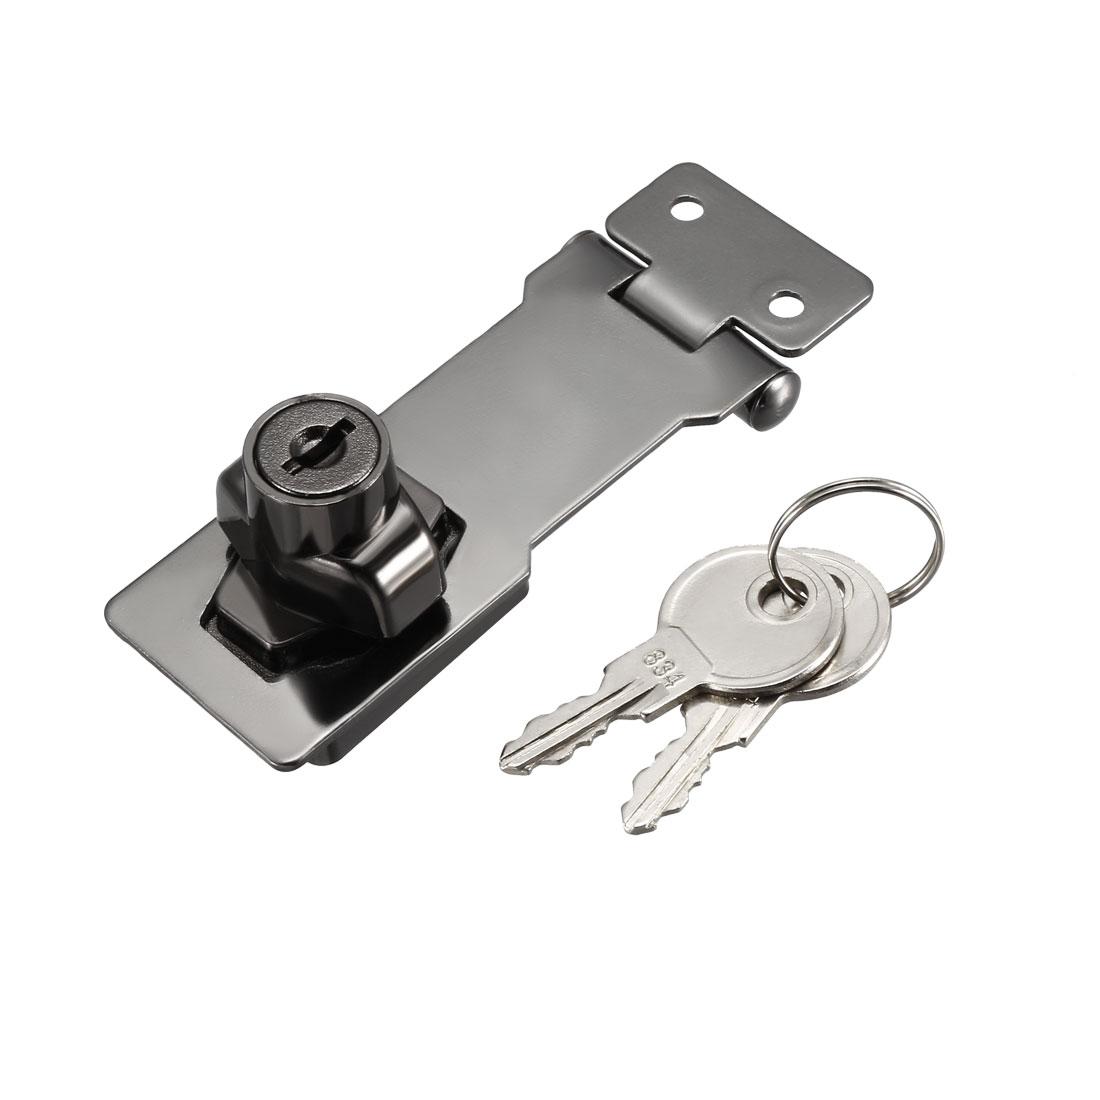 Keyed Hasp Lock 95mm Twist Knob Keyed Locking Hasp Bright Black